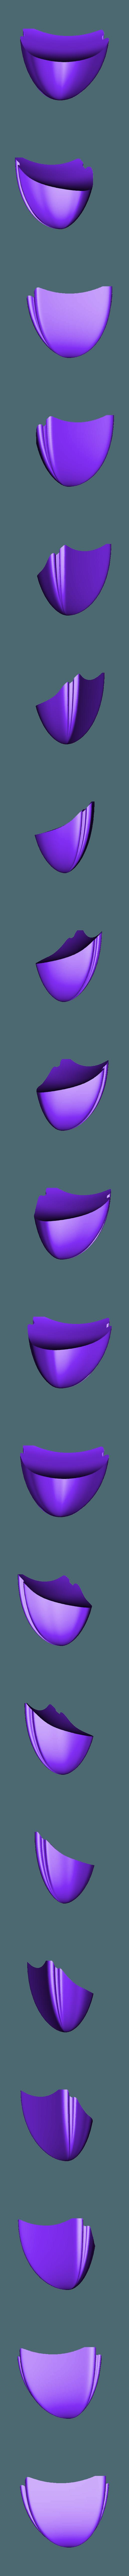 beak yellow.stl Télécharger fichier STL gratuit Badtz-Maru (バッドばつ丸, Baddo Batsu Maru) • Modèle pour impression 3D, Jangie